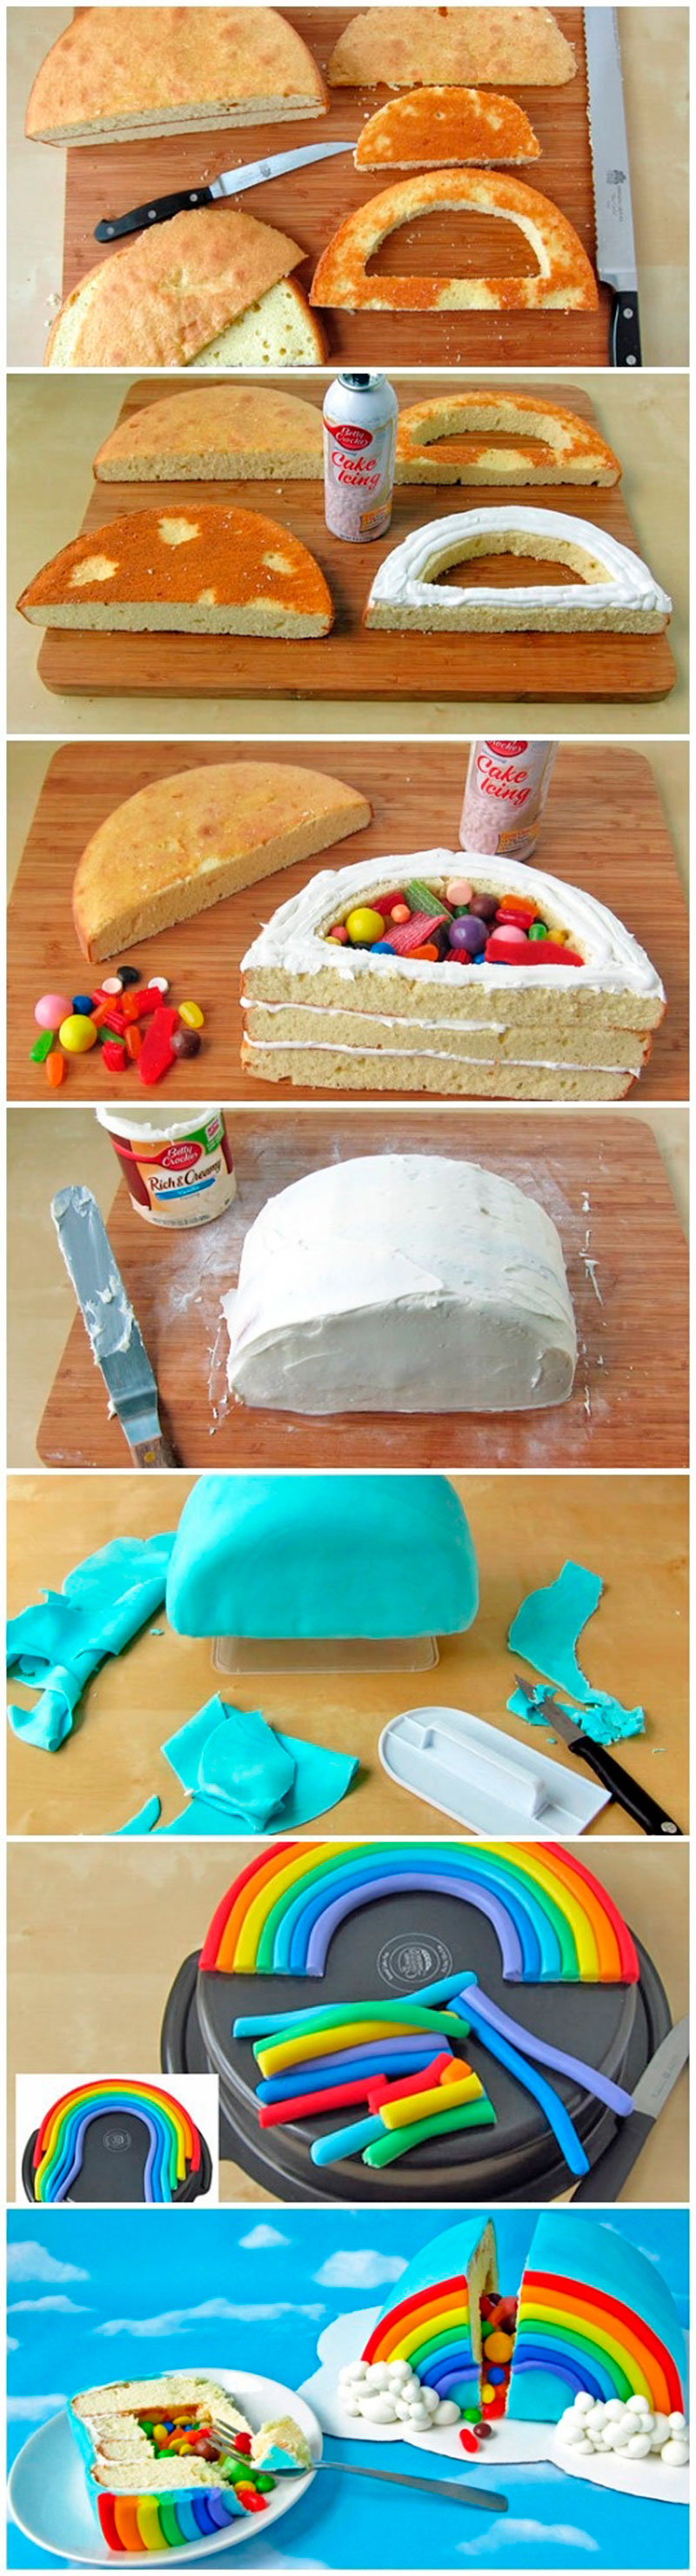 Montar bolo infantil 12